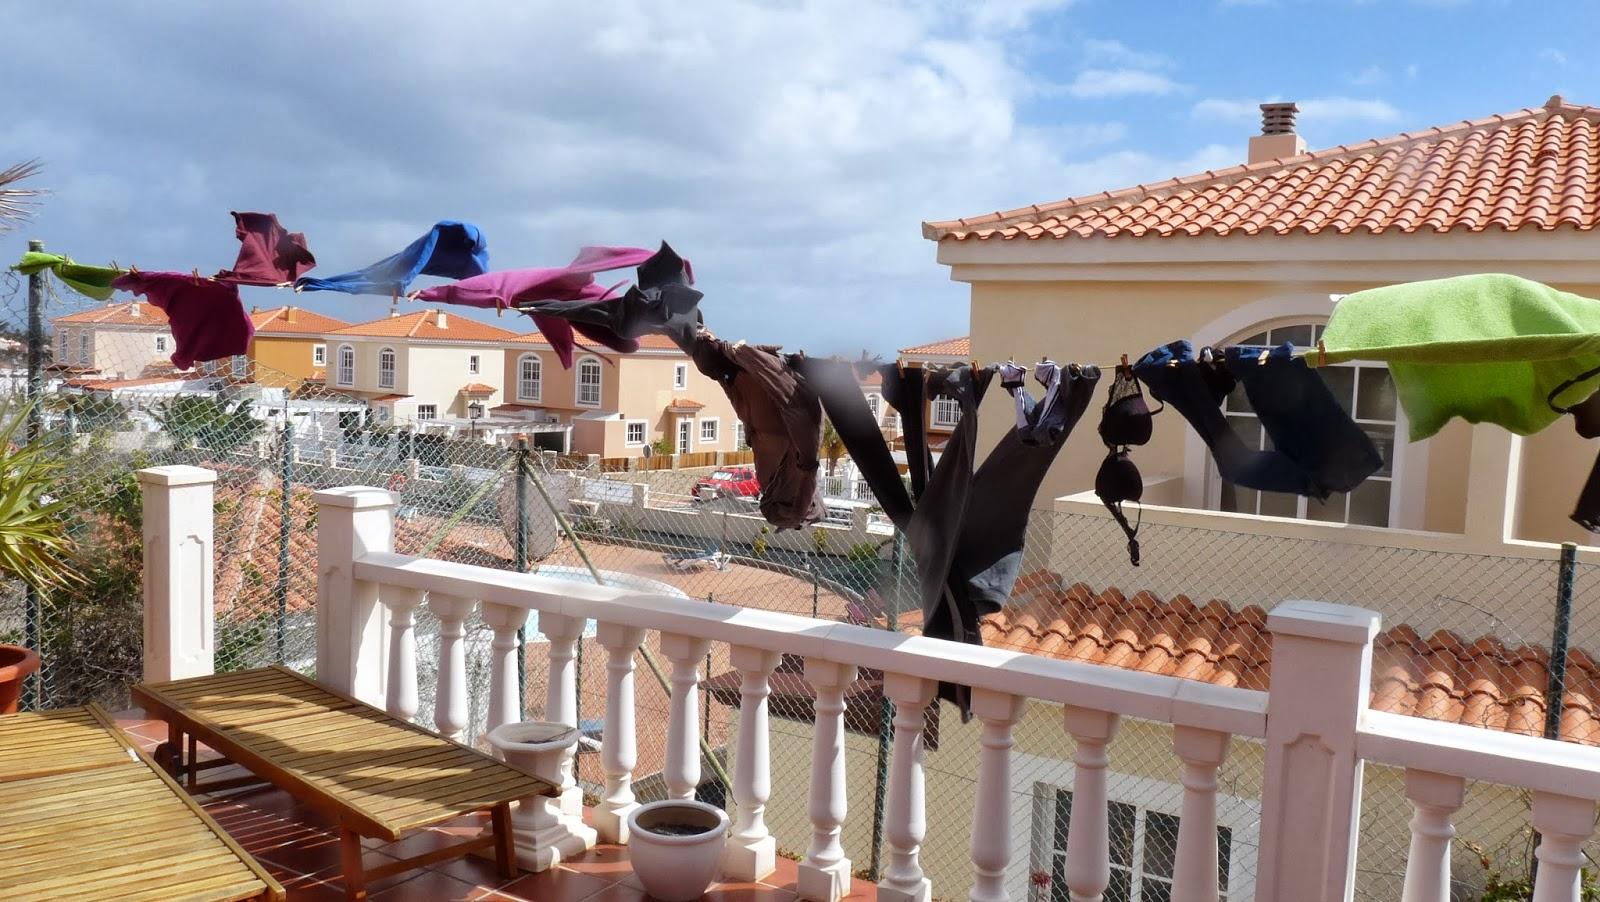 Fuerteventura 2014: Fuerteventura 23. Februar bis 03. März 2014